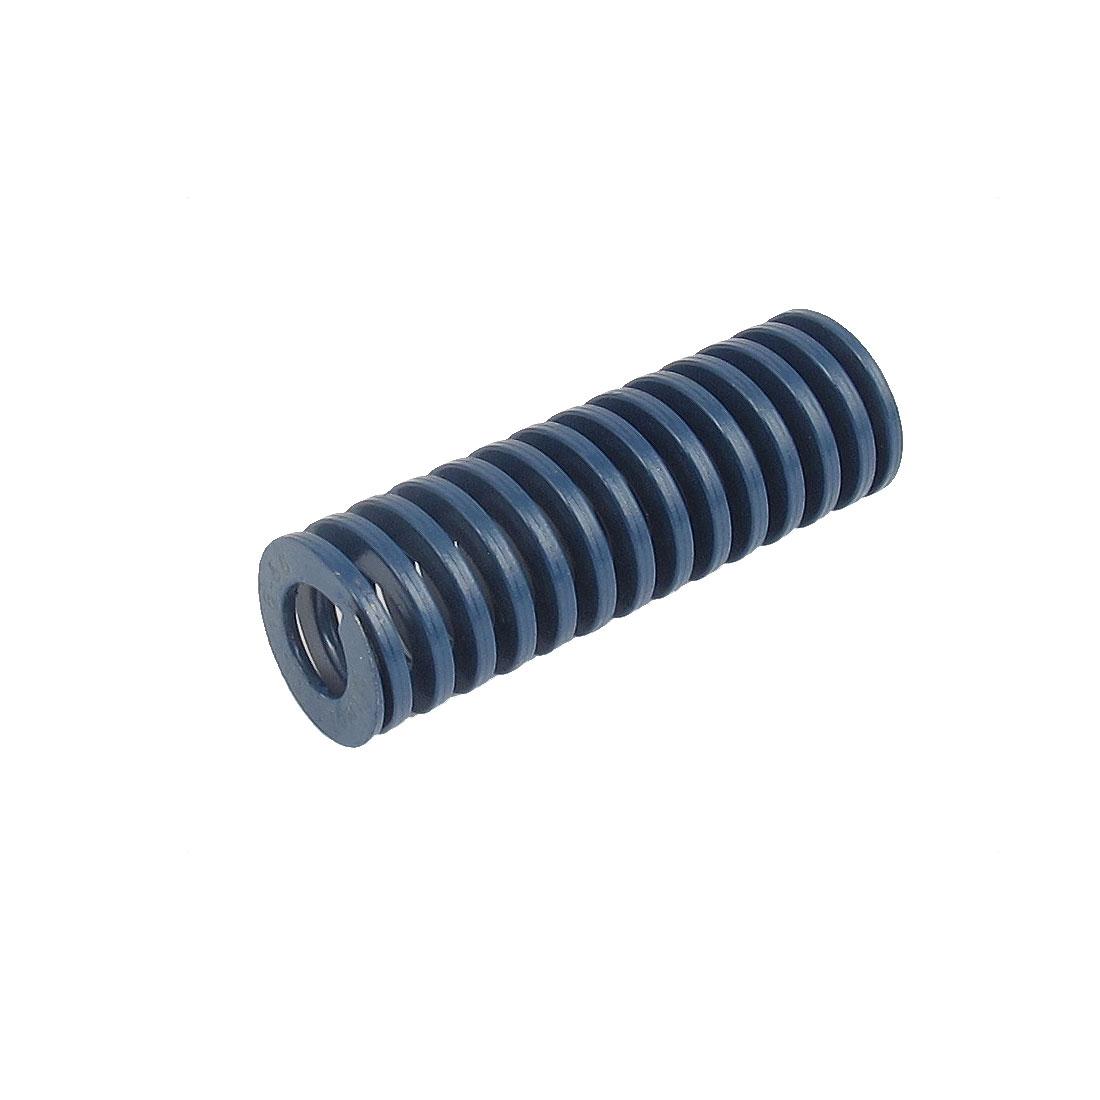 18mmx55mm Chromium Alloy Steel Light Load Die Spring Blue